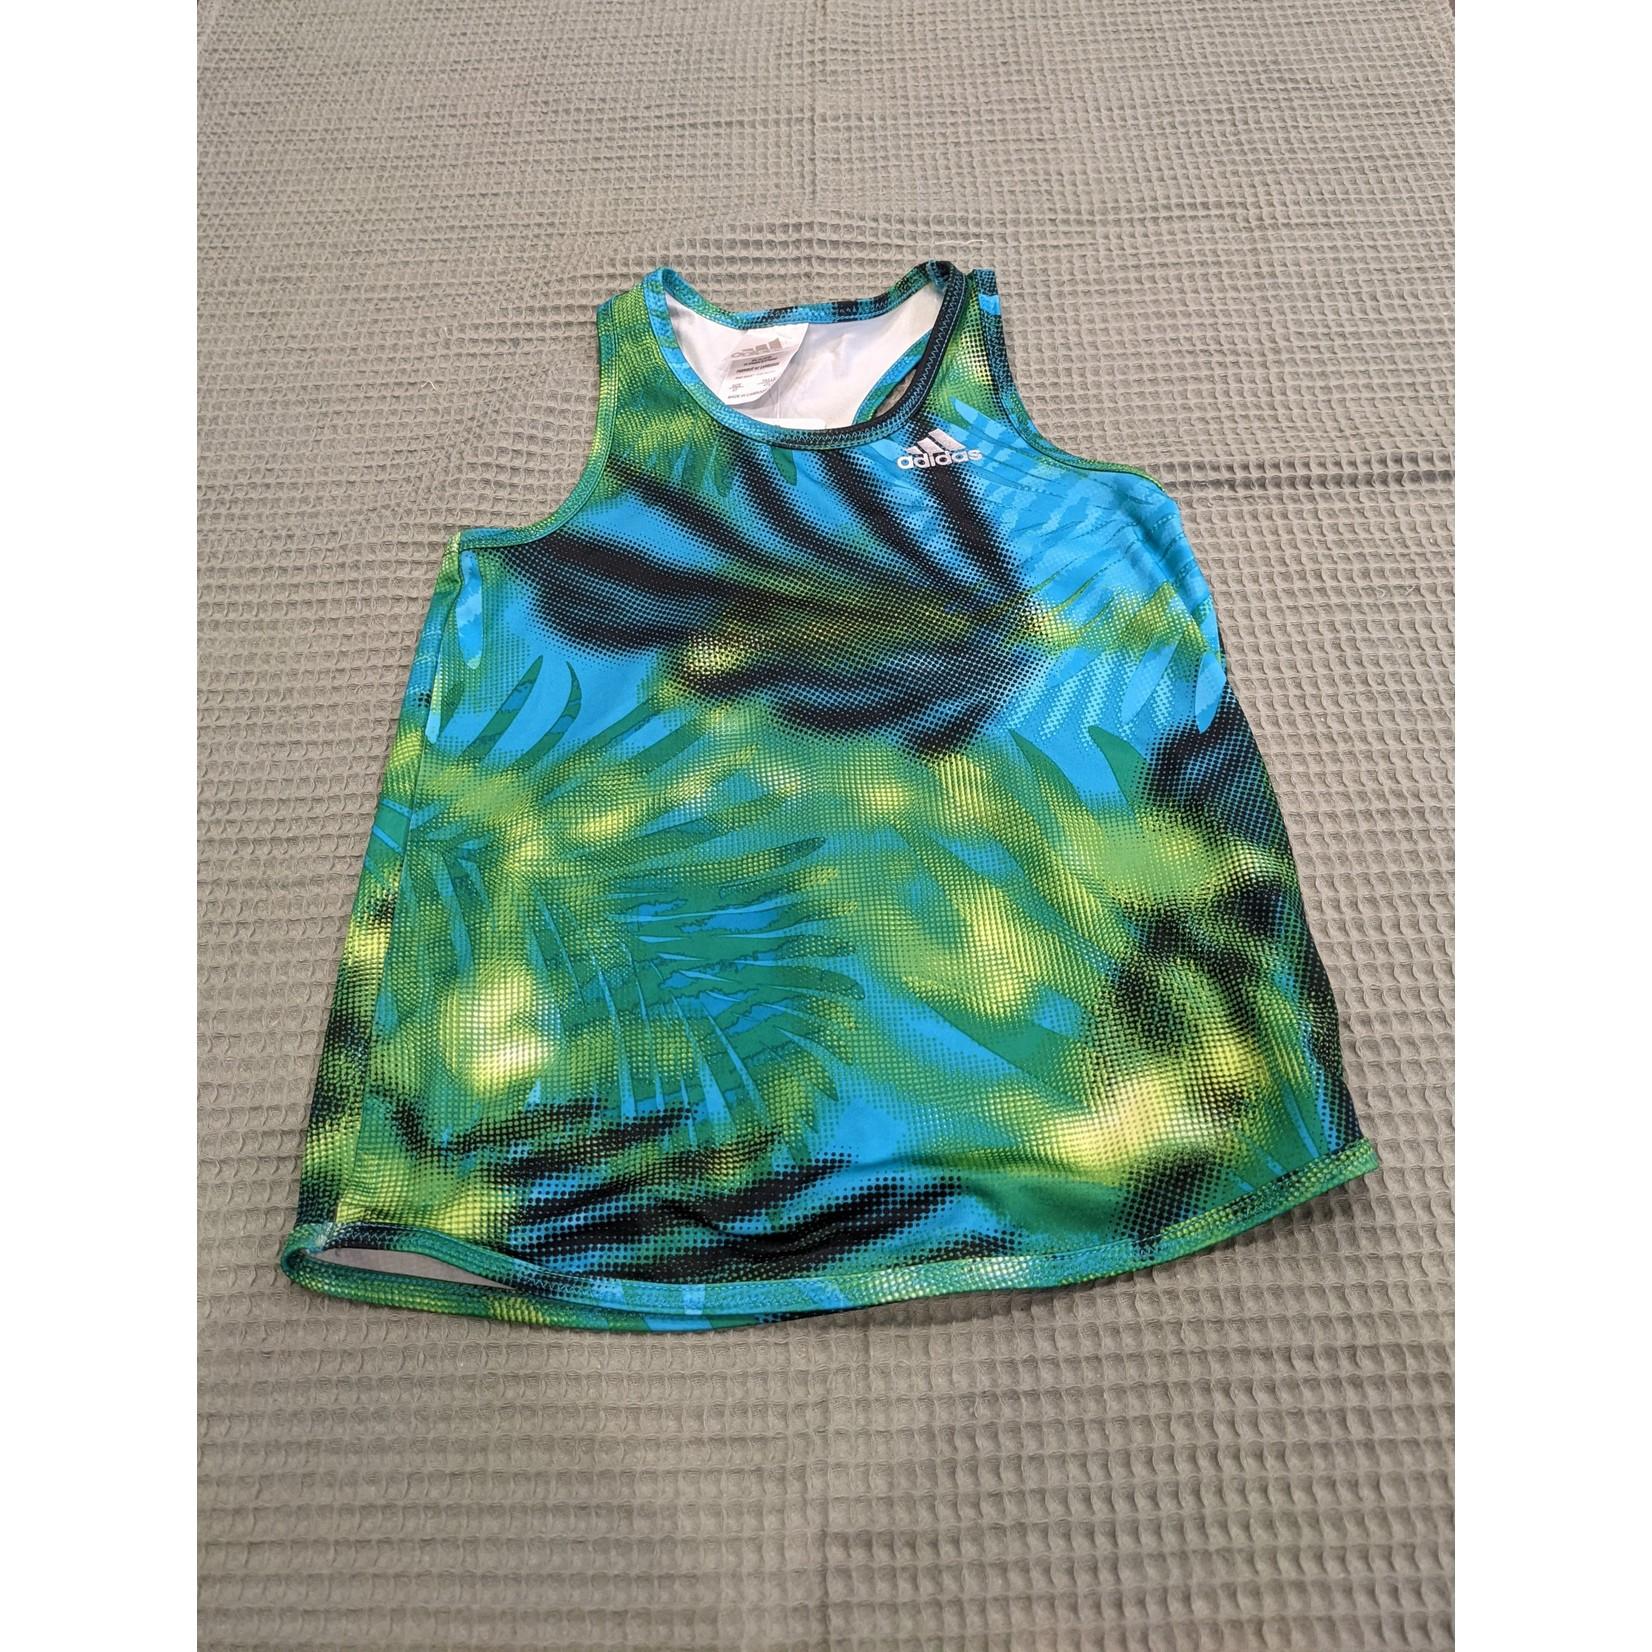 #65 Camisole Adidas